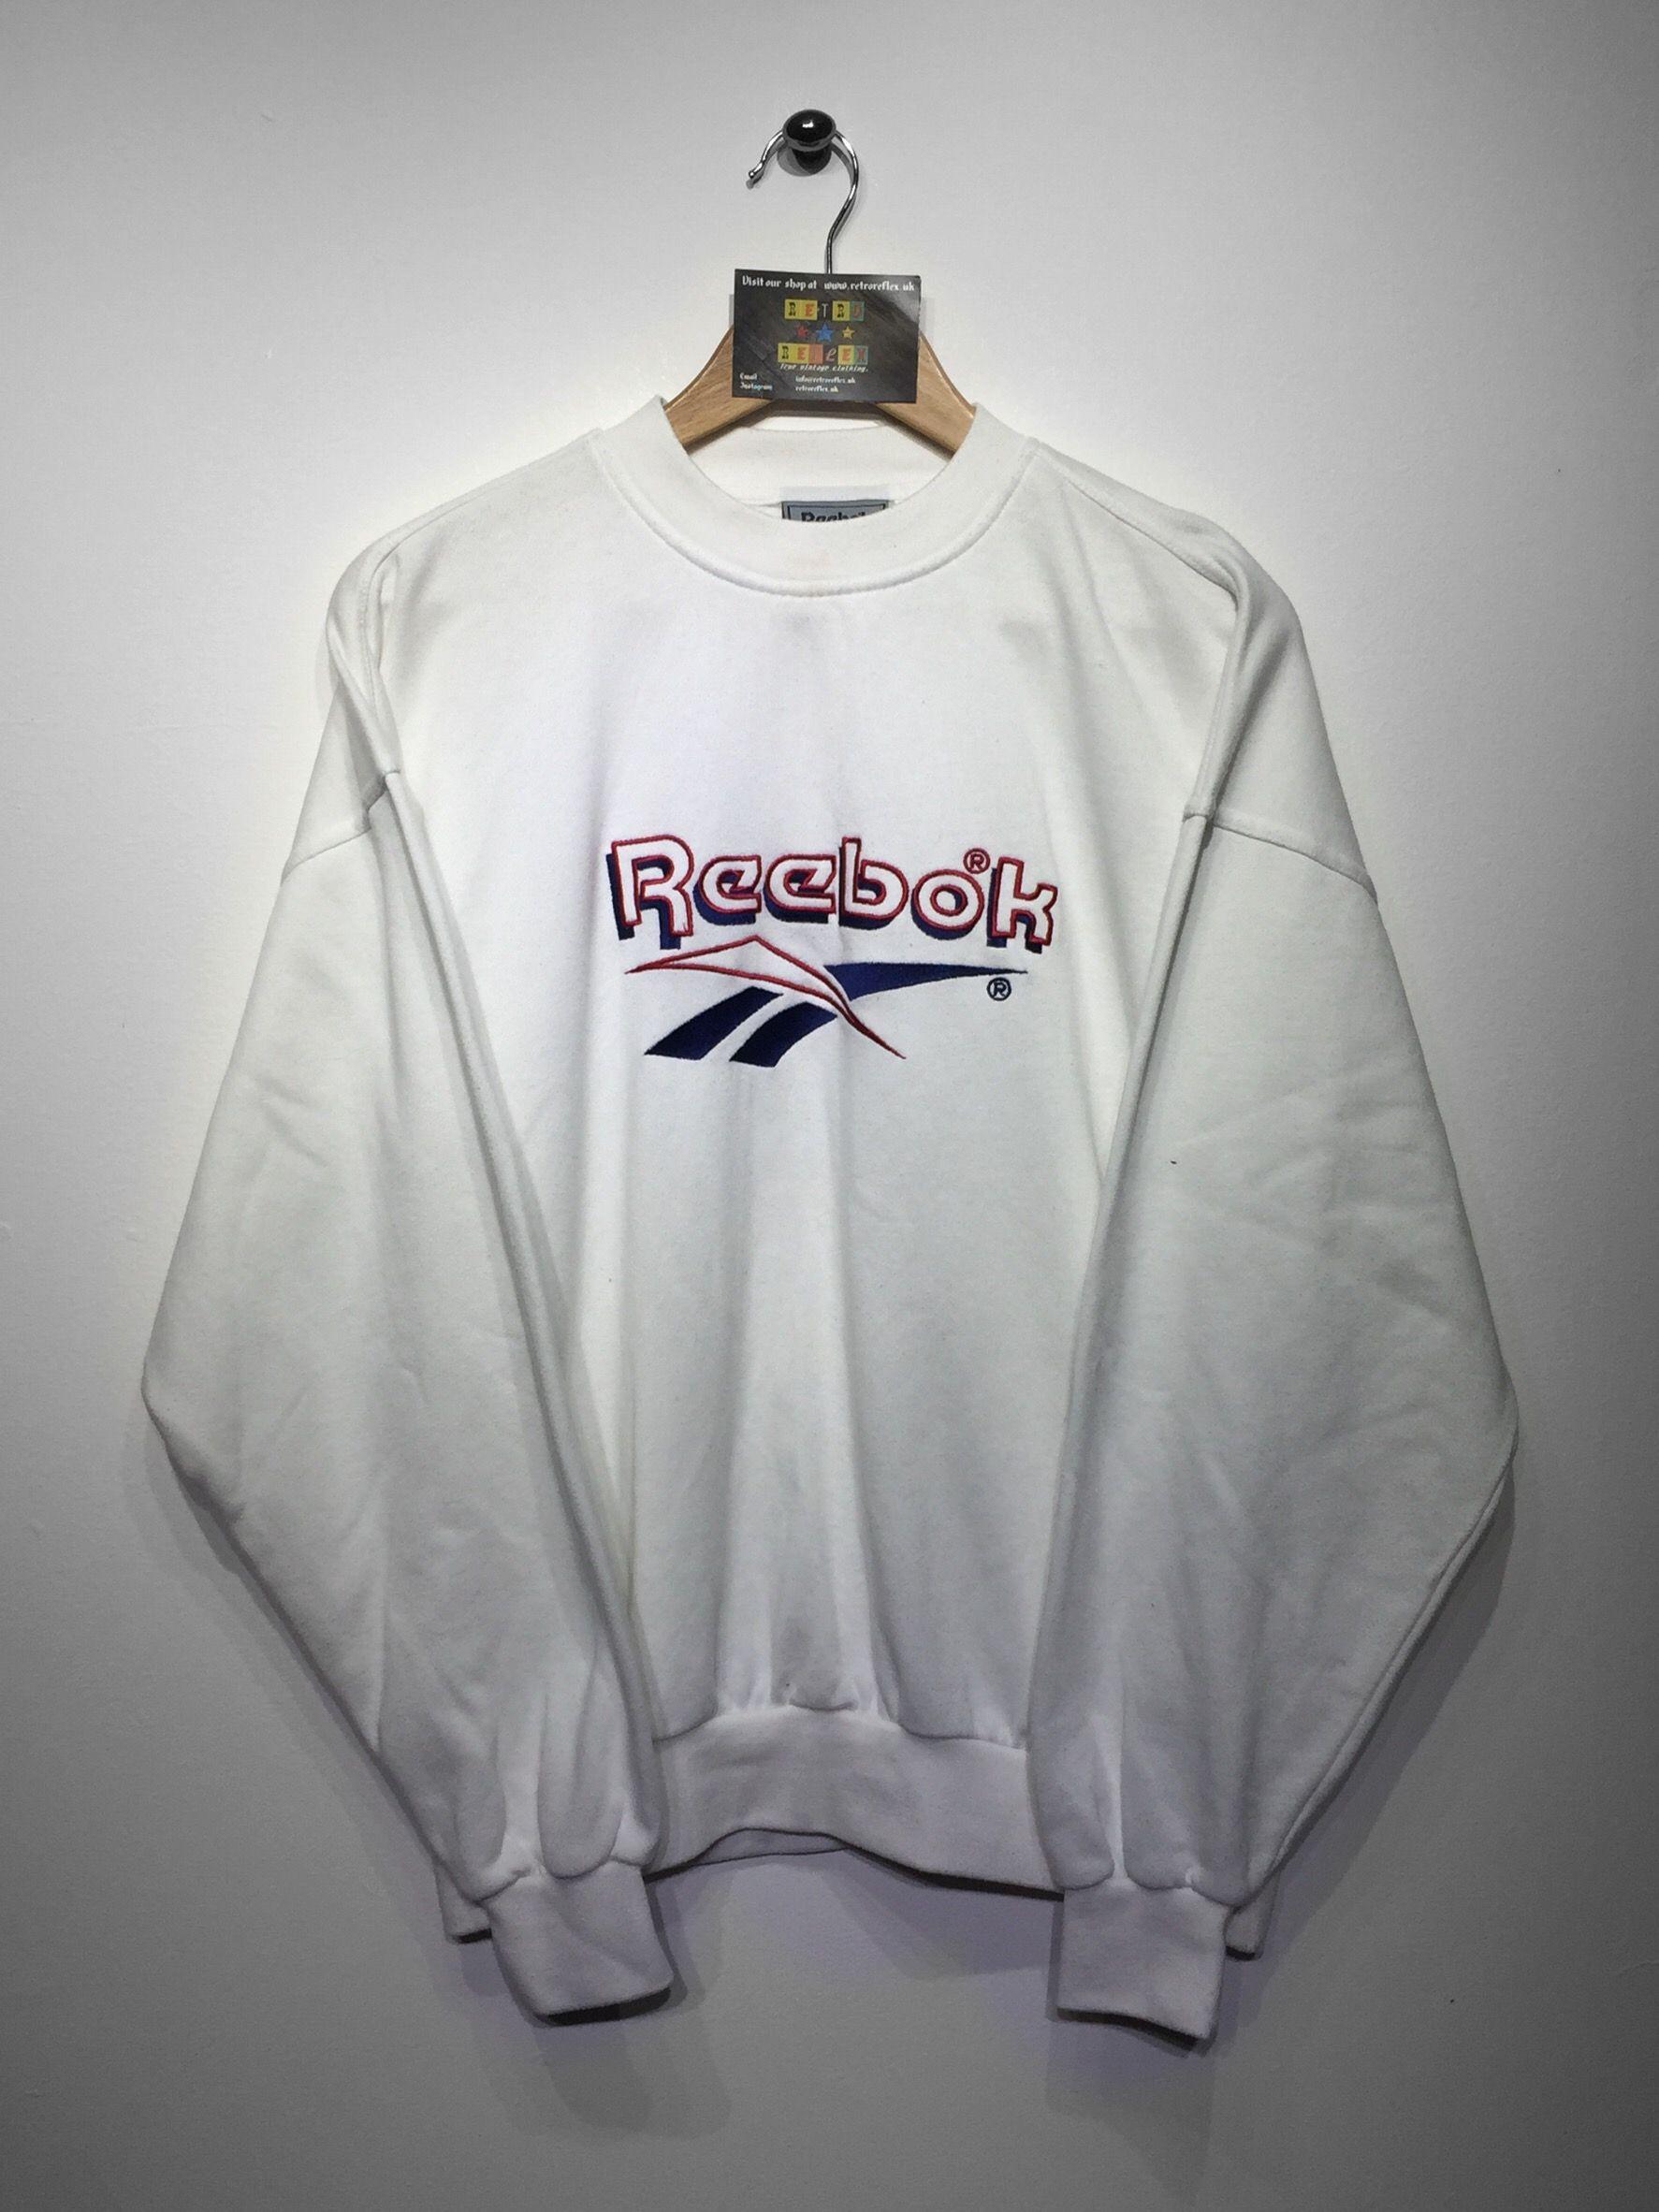 ... Retroreflexuk vintage   retro clothing. Reebok Sweatshirt size Medium  (but Fits Oversized) £34 Website➡ www. fd900bb0d